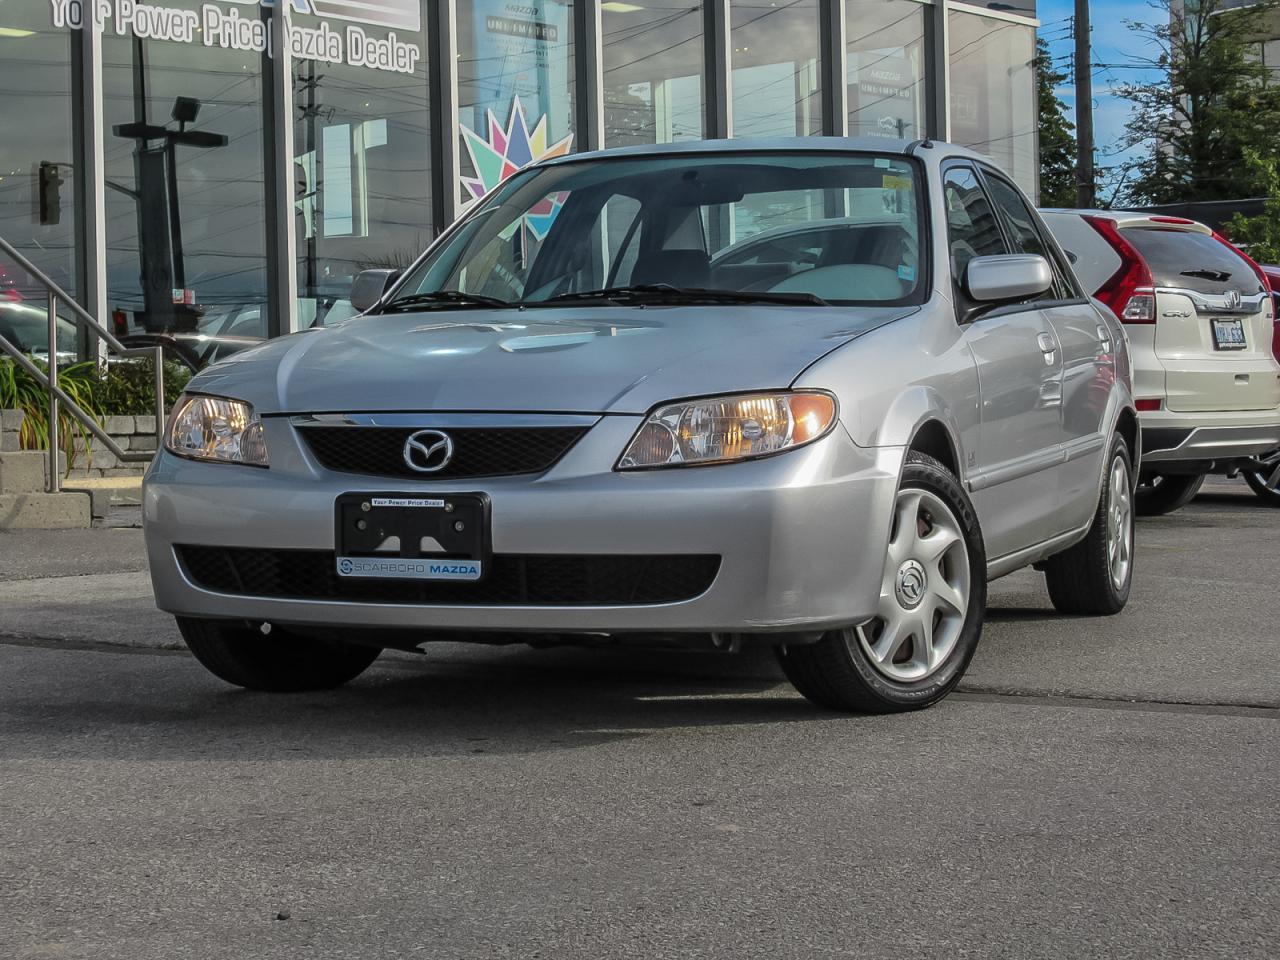 2002 Mazda Protege LOAD AUTOMATIC LOW KM